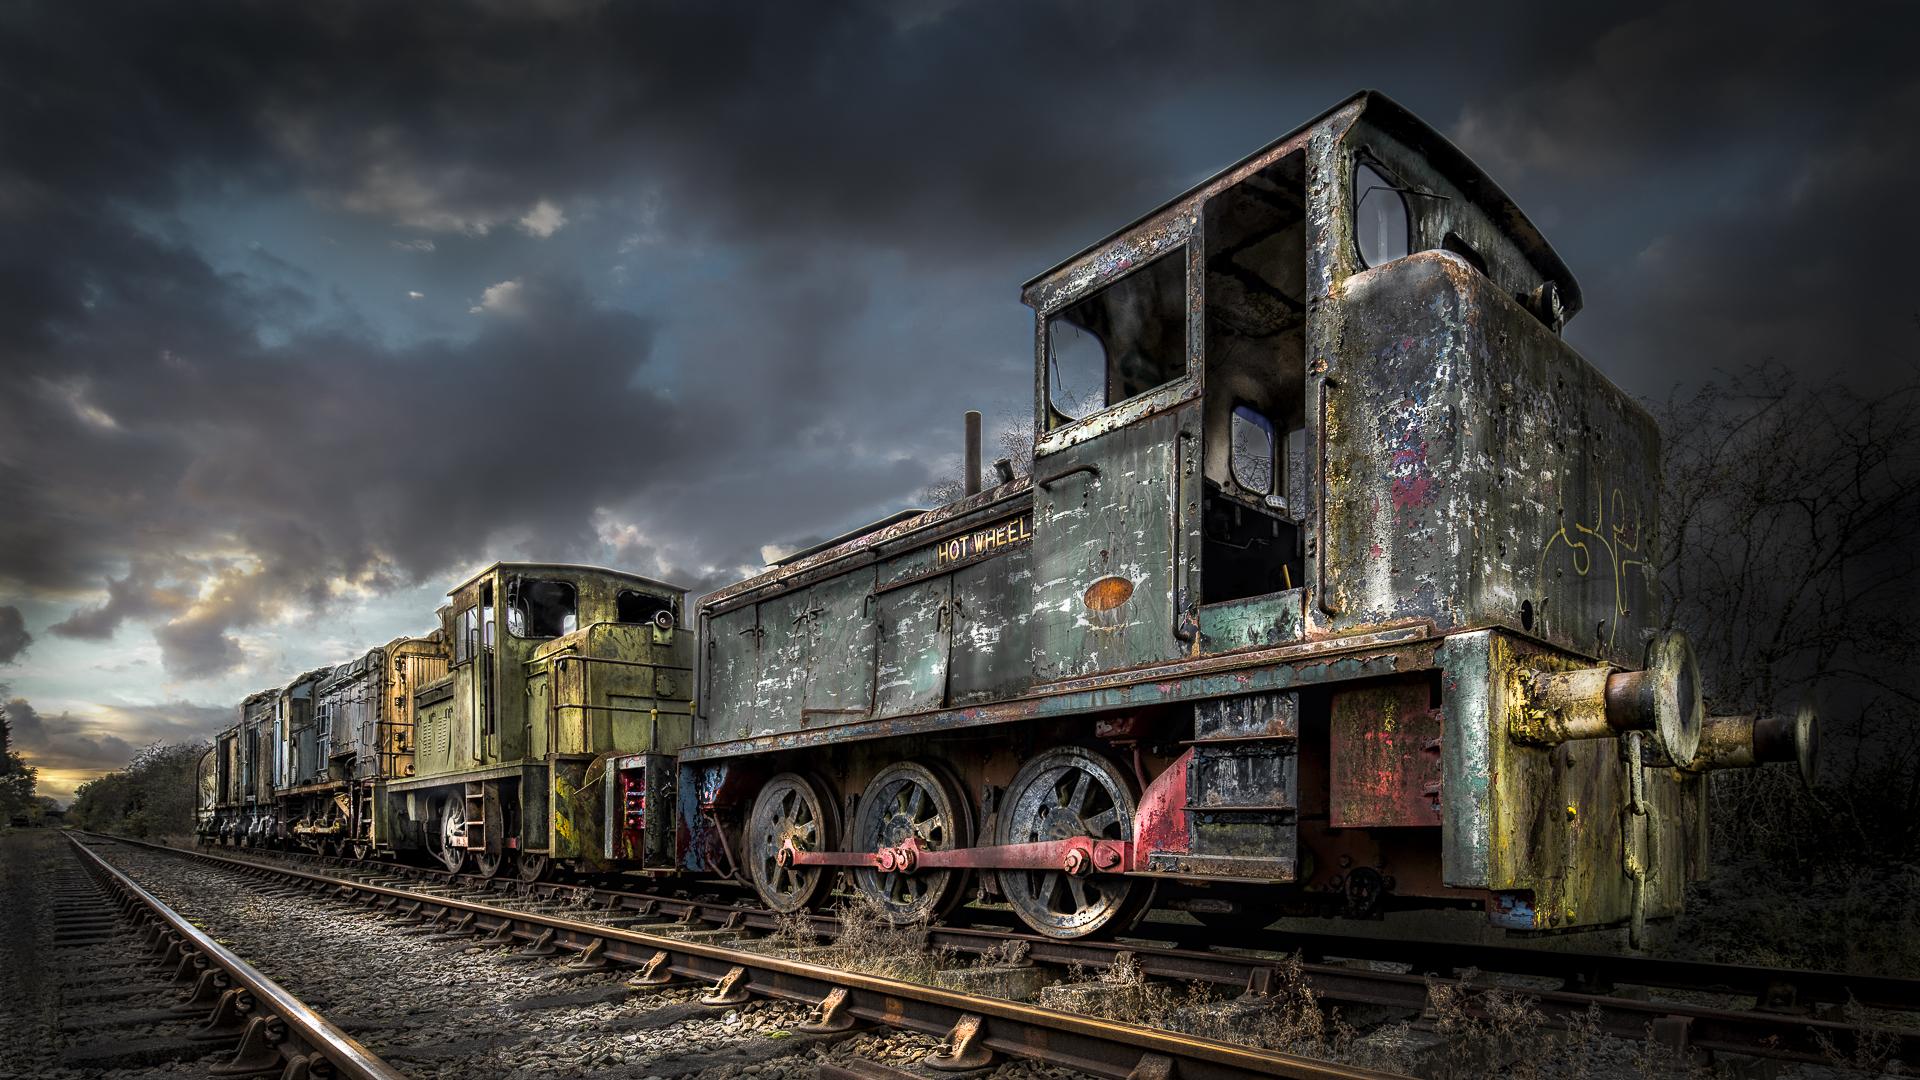 Hot Wheels by James Botterill